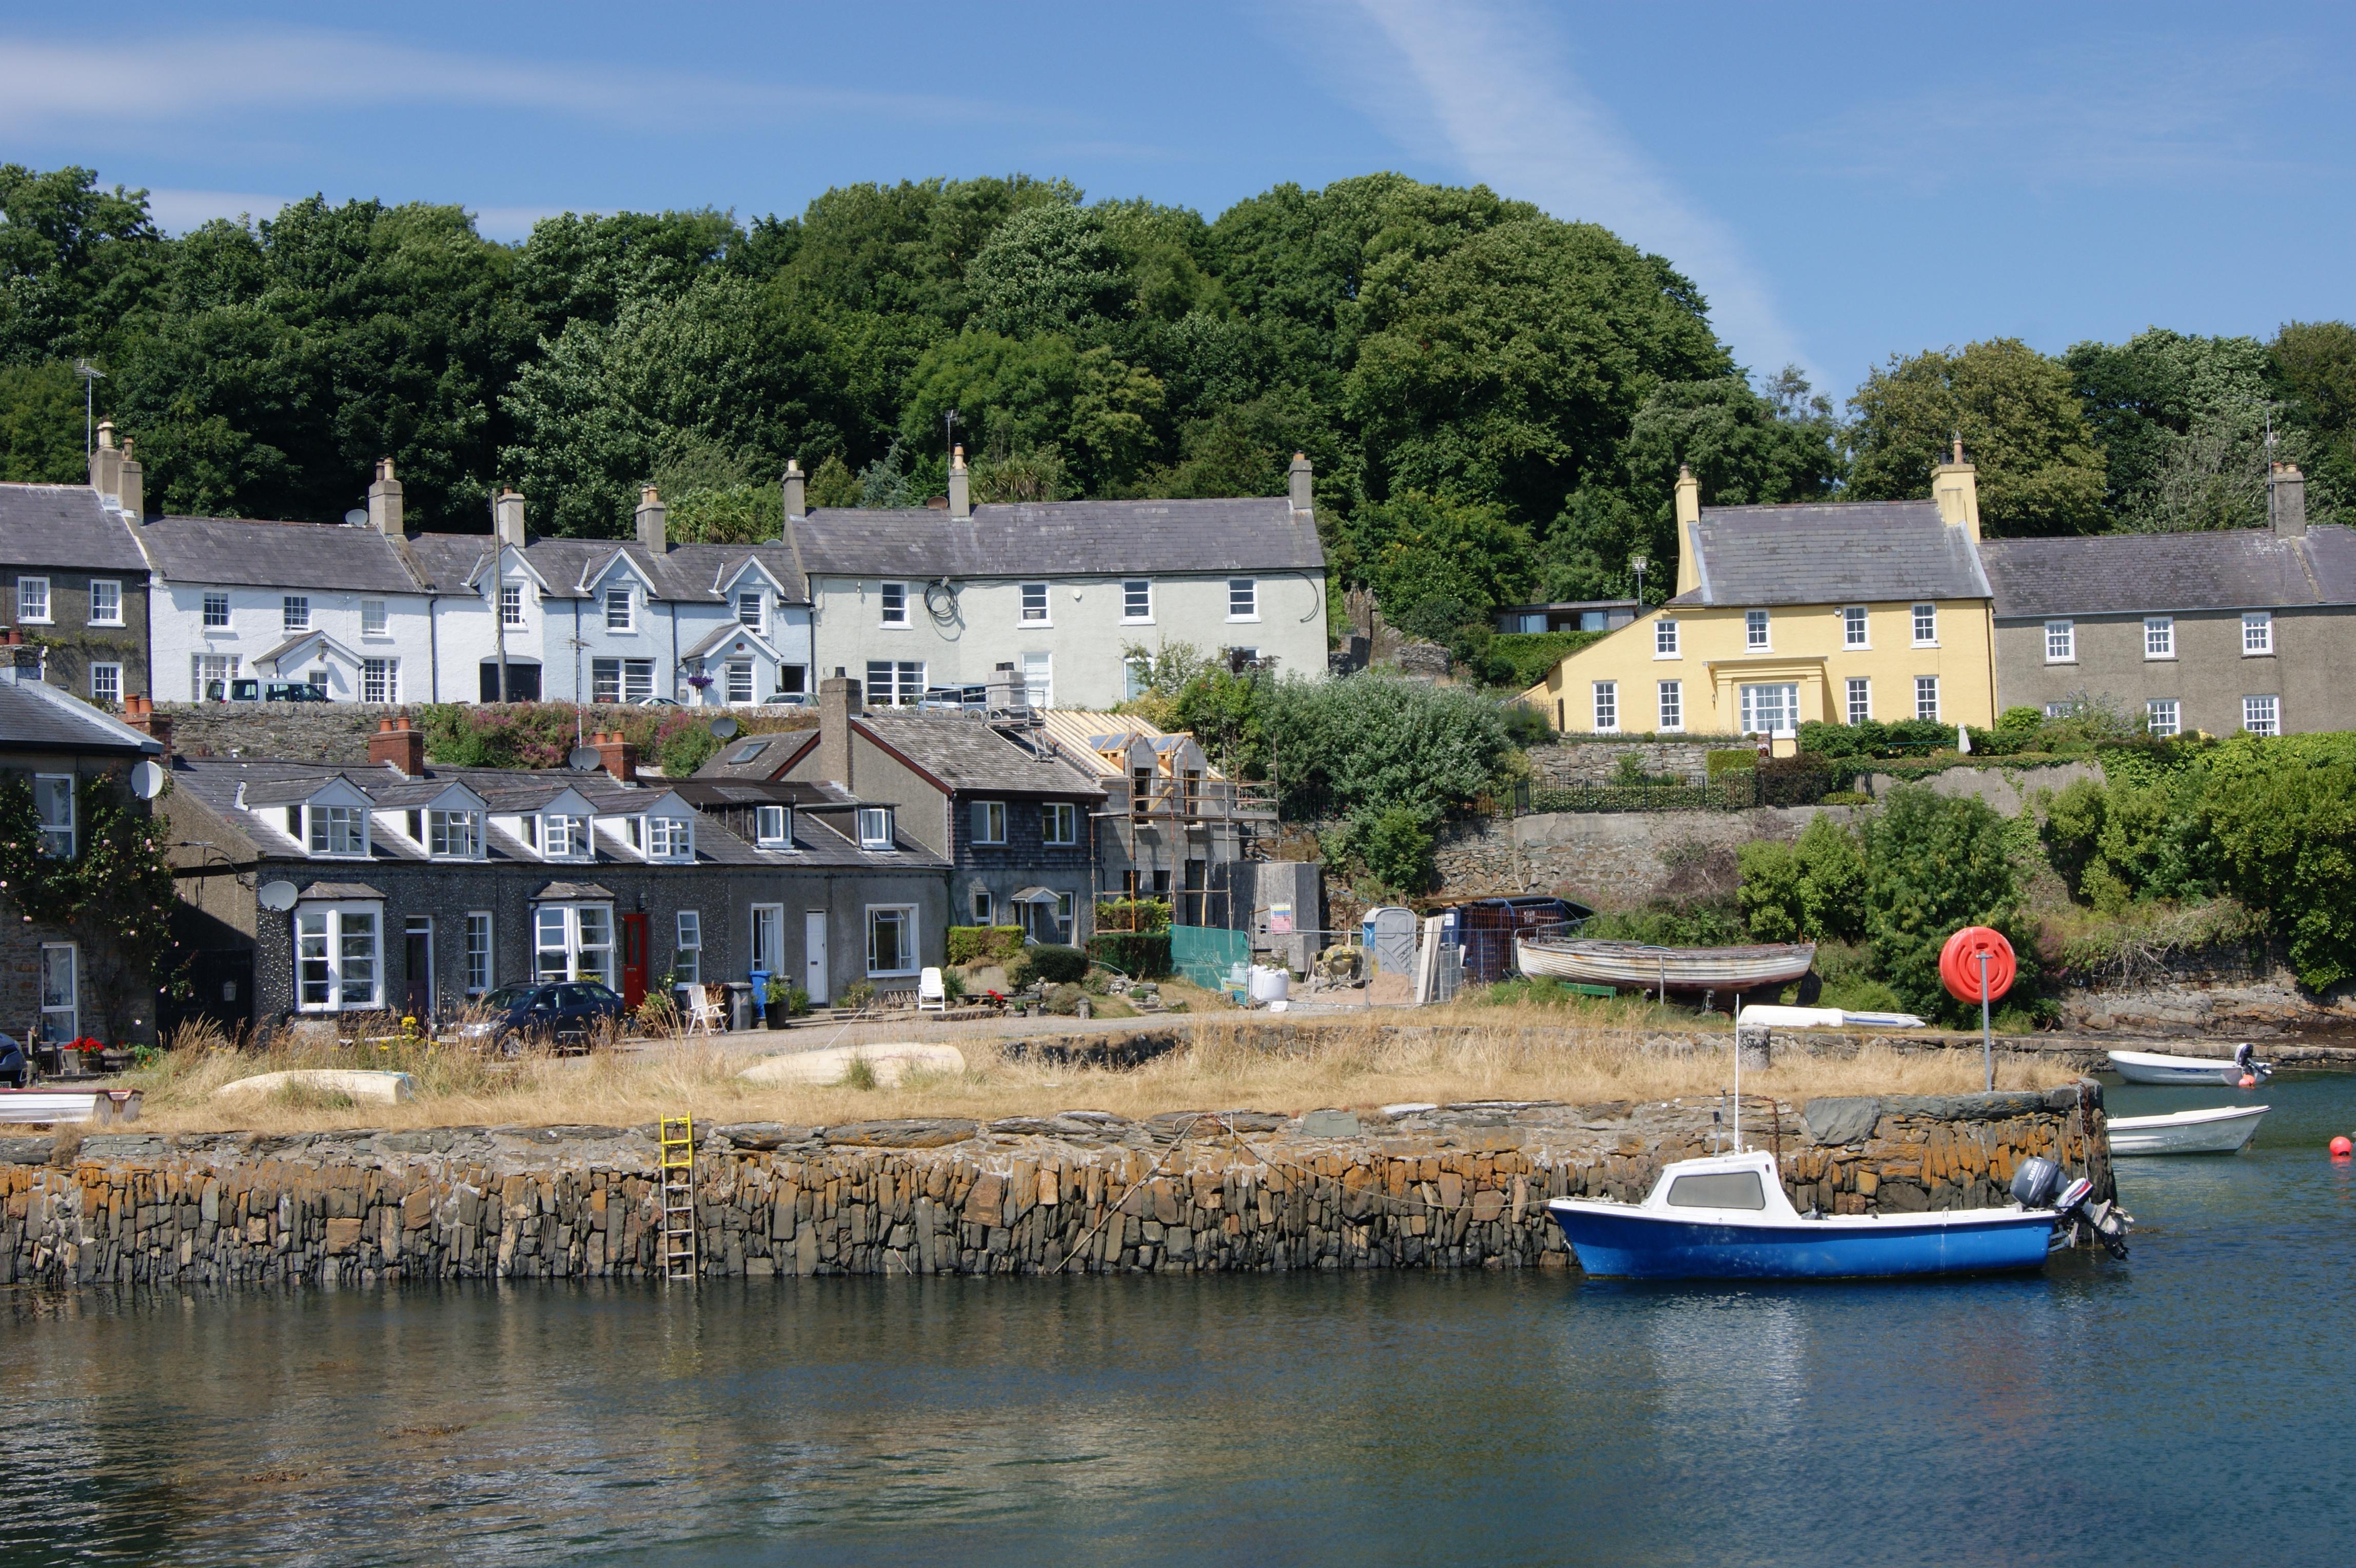 Harbourside Strangford, County Down, Northern Ireland